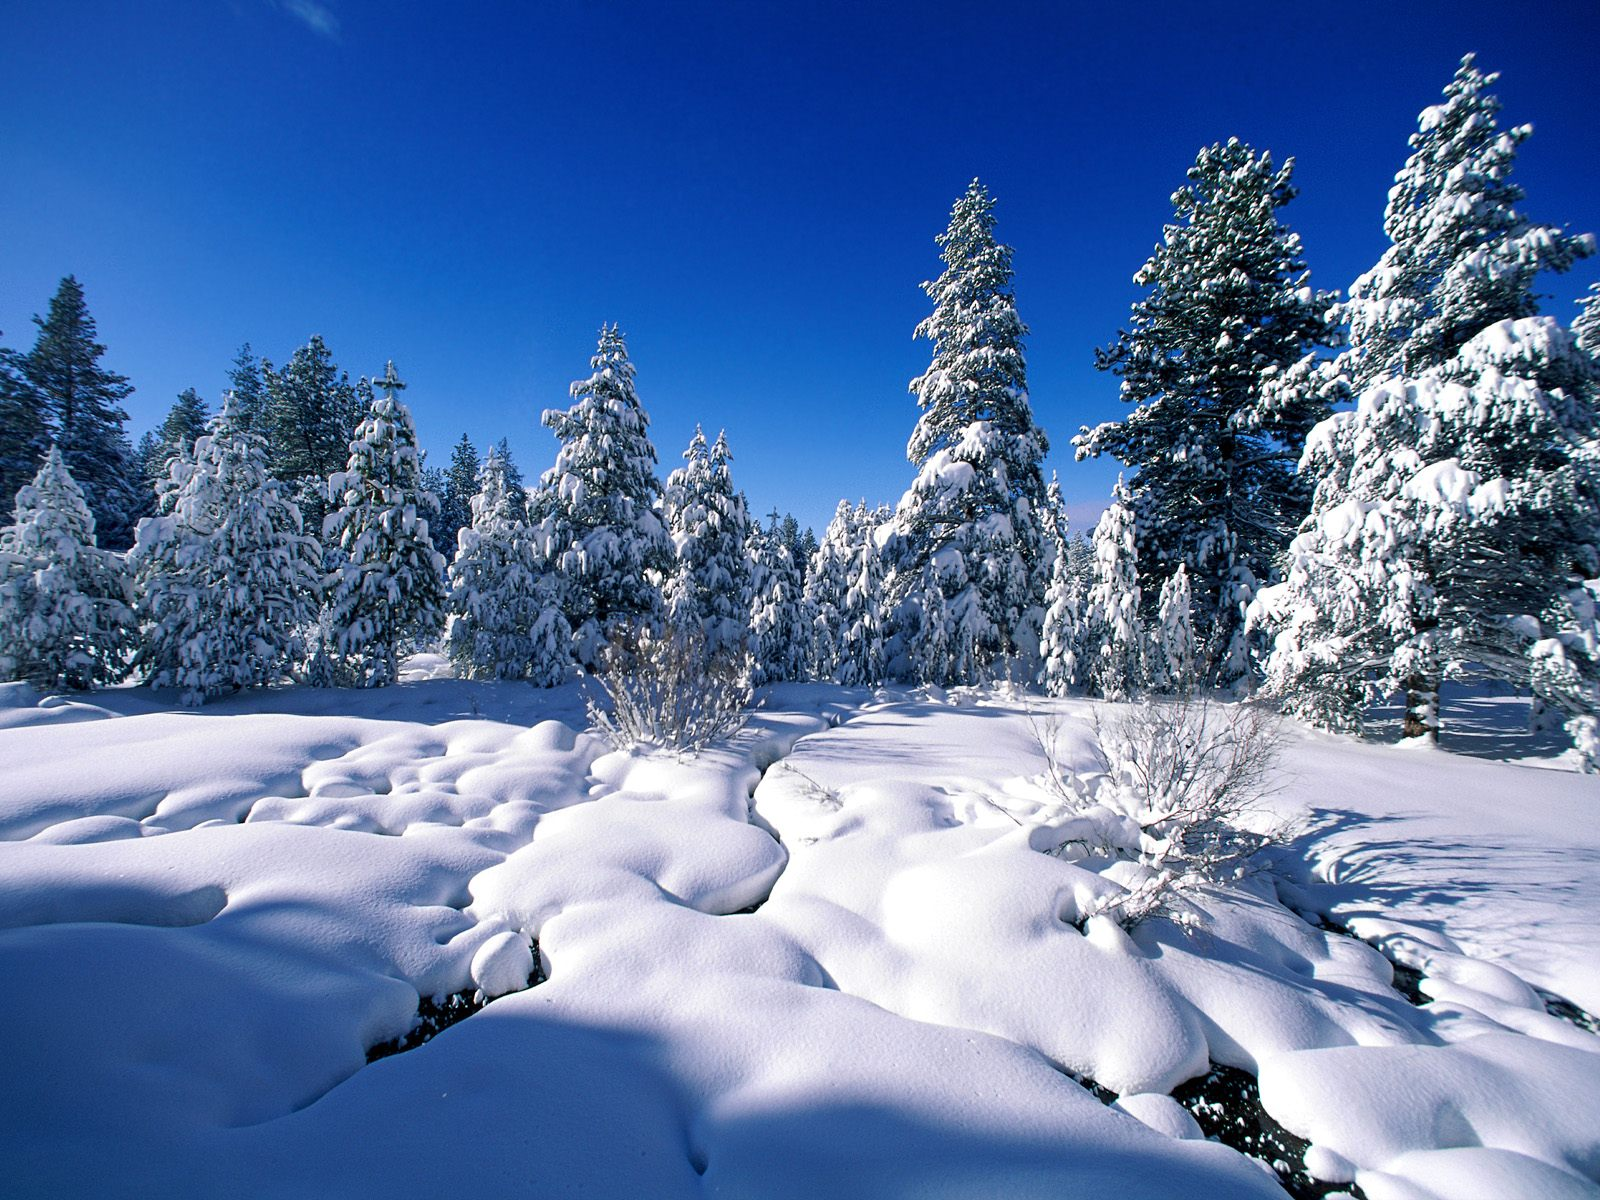 hd desktop background Snow Desktop Backgrounds 1600x1200